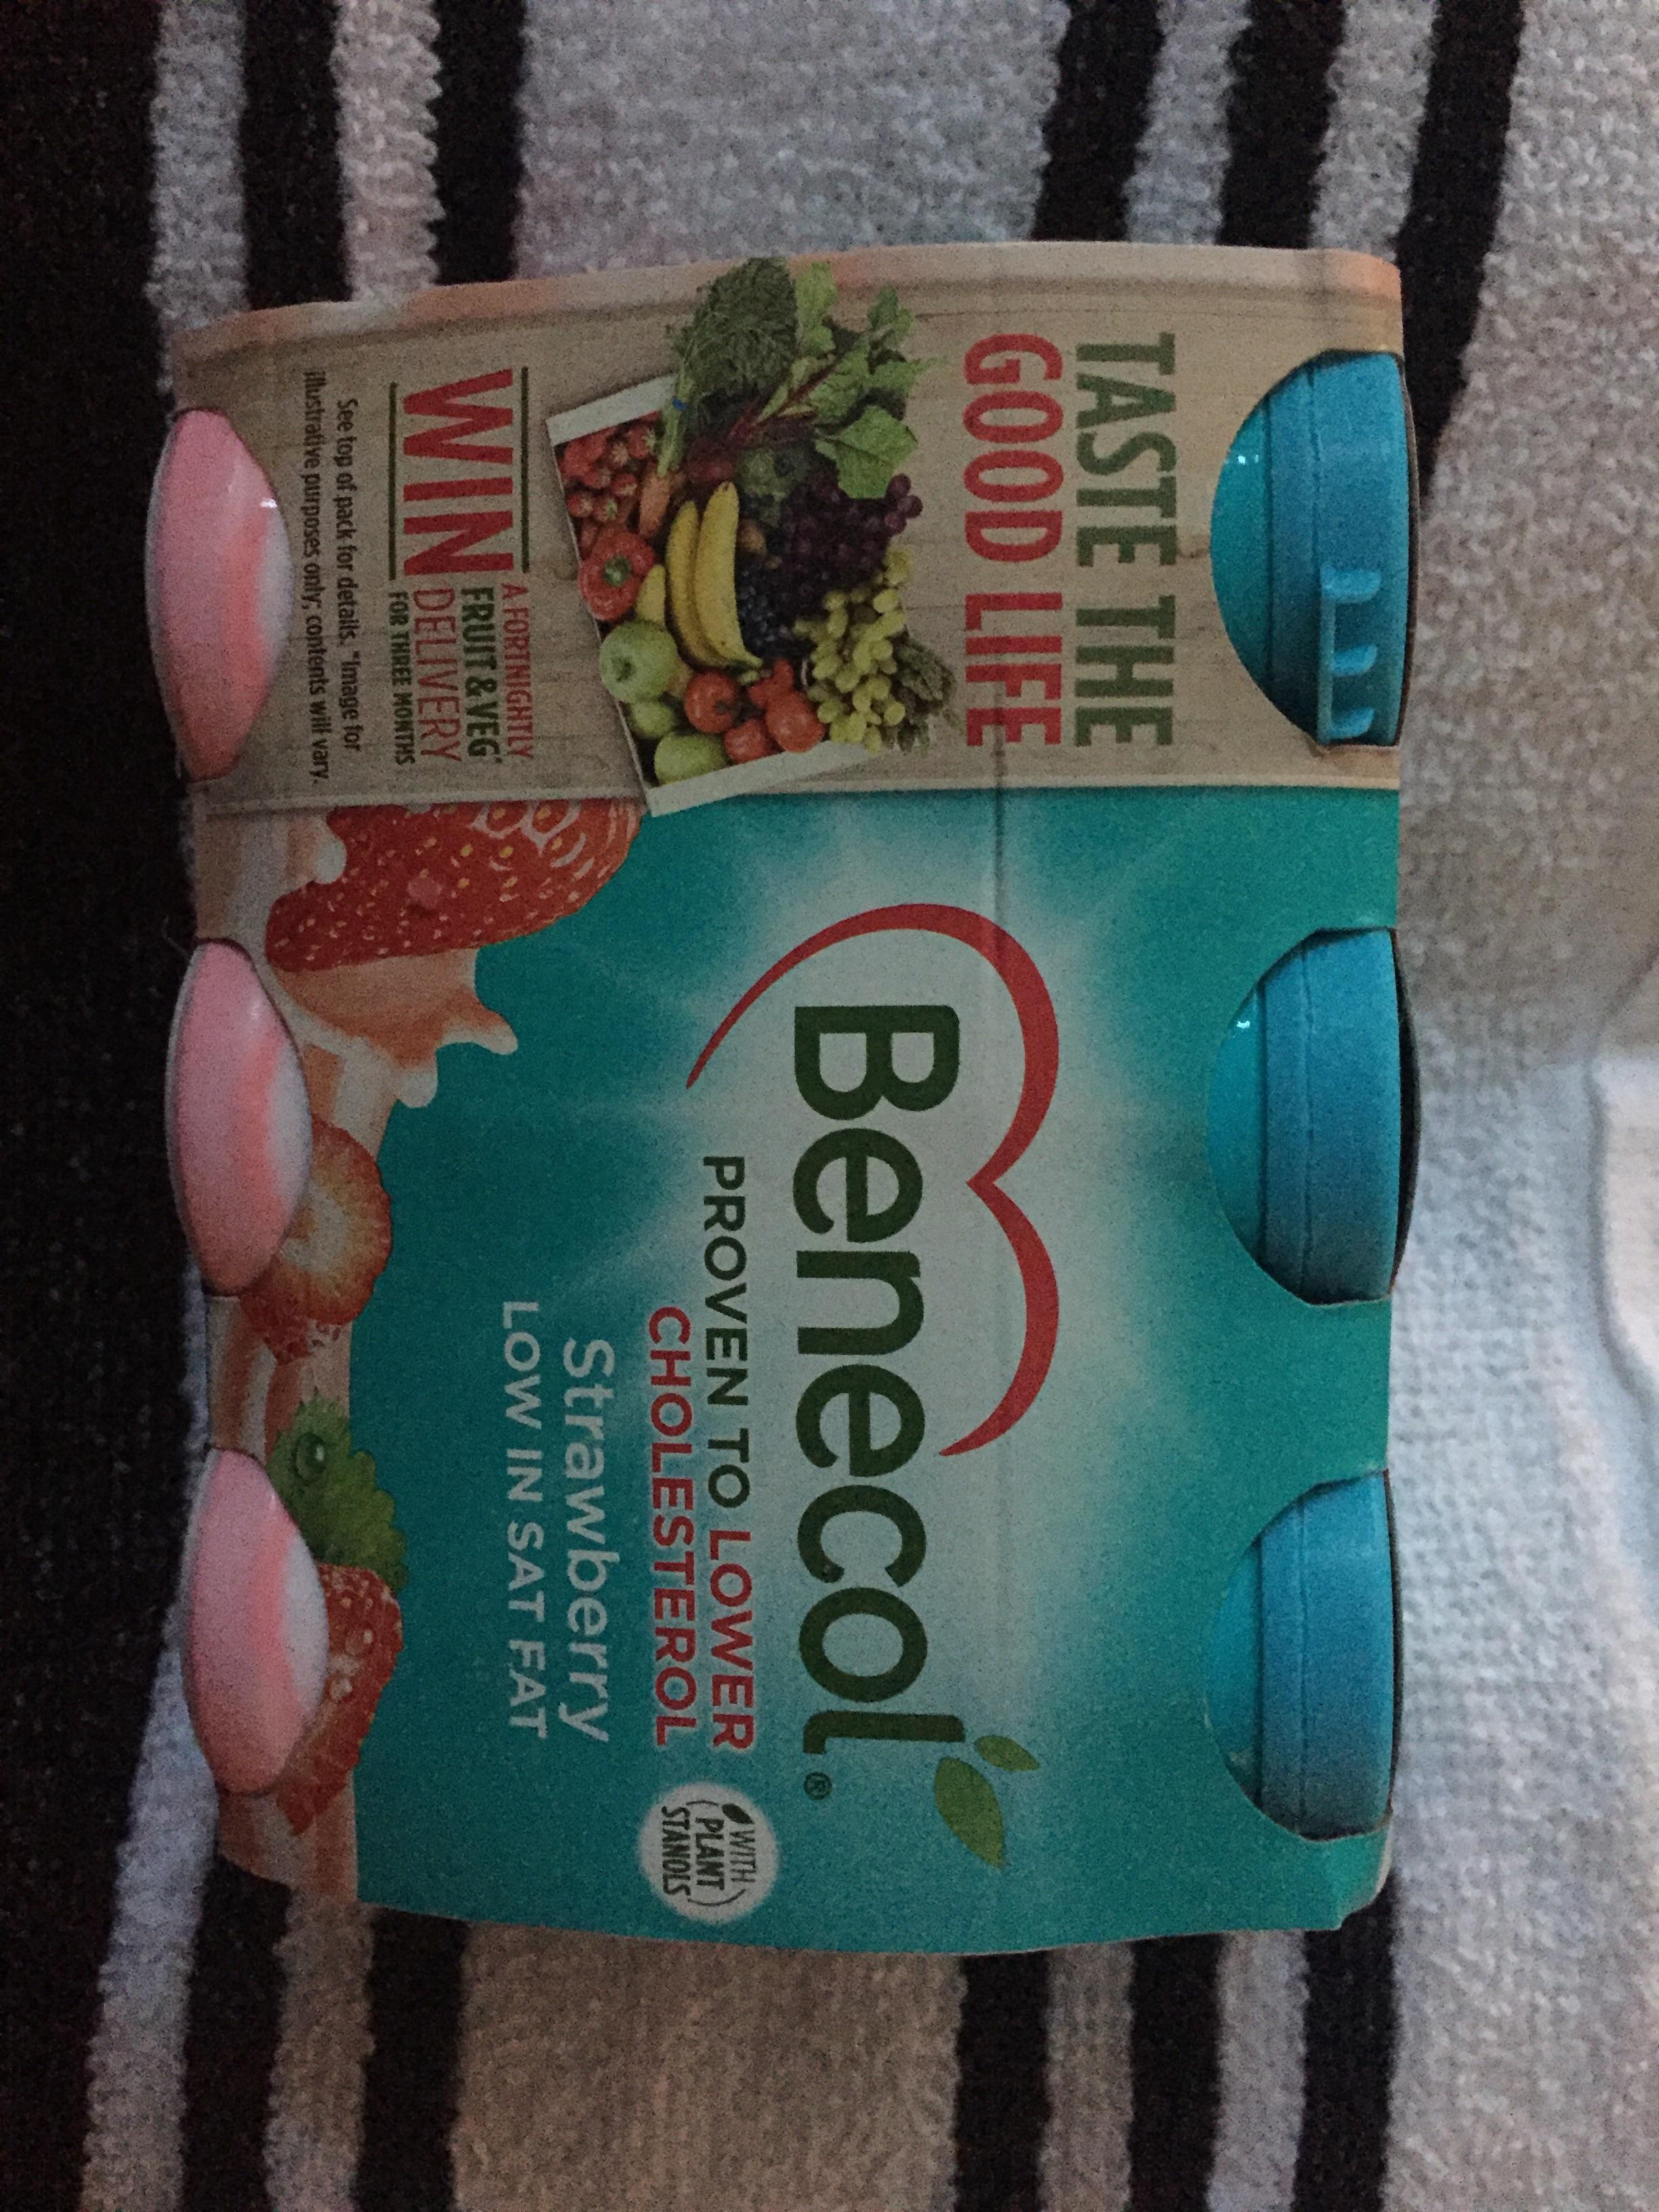 Benecol 6 pack strawberry / original yogurt drinks 69p in Heron